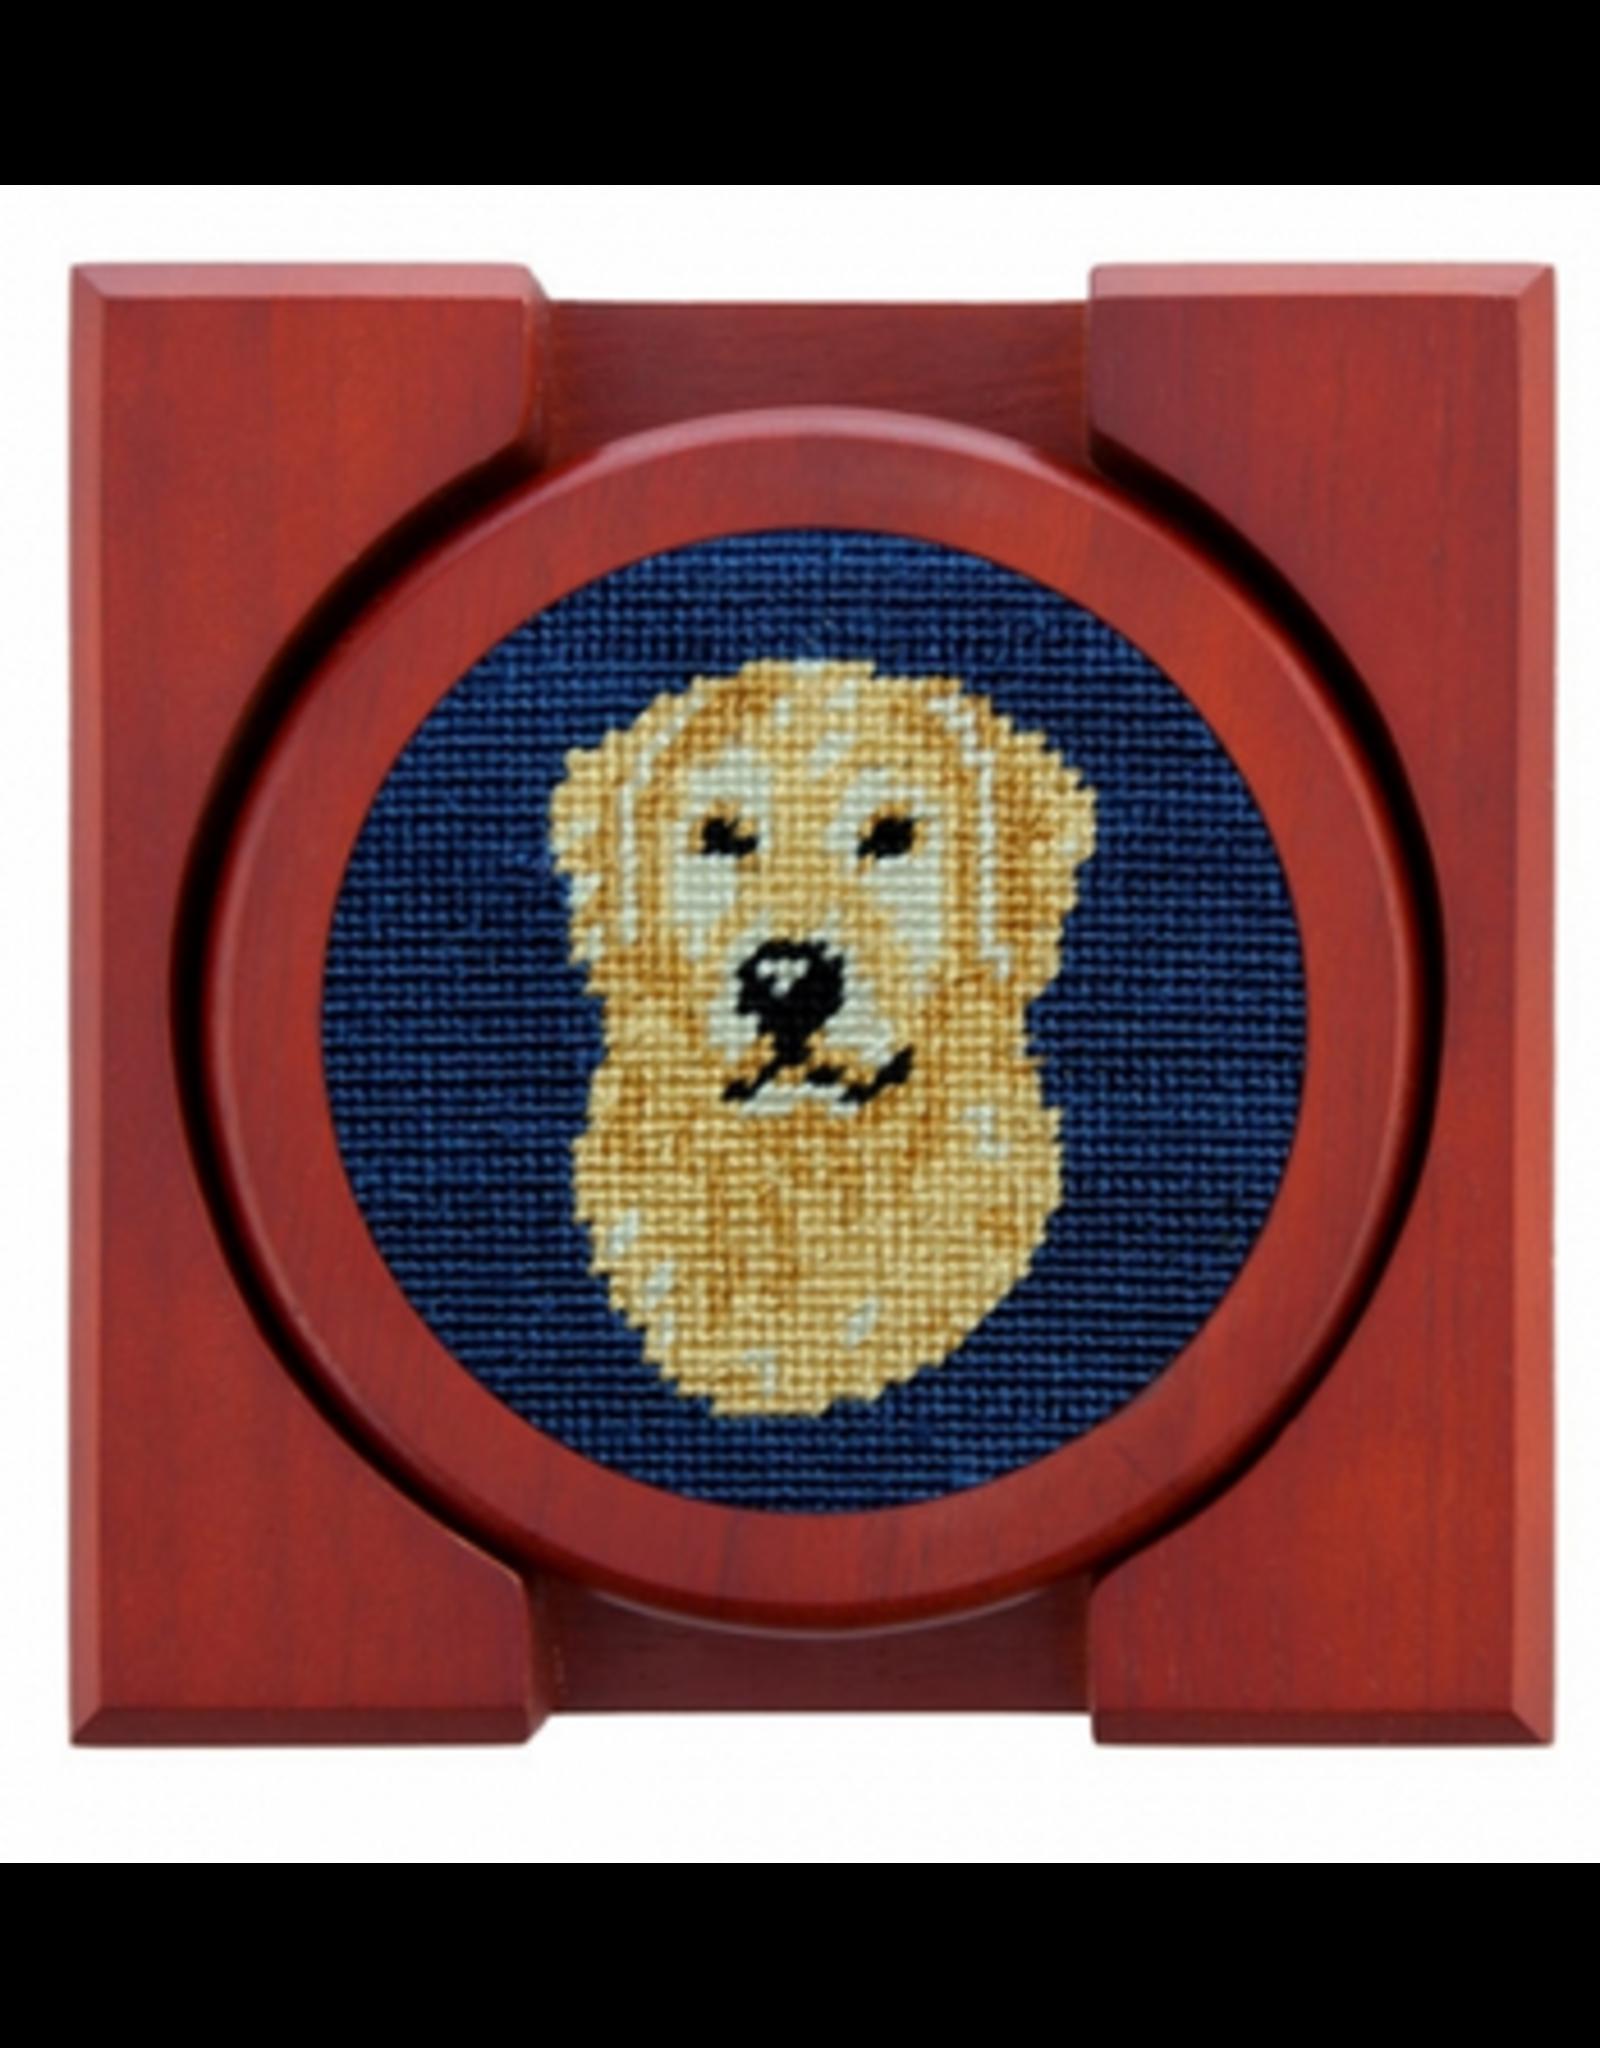 Smathers & Branson Golden Retriever Head Coasters